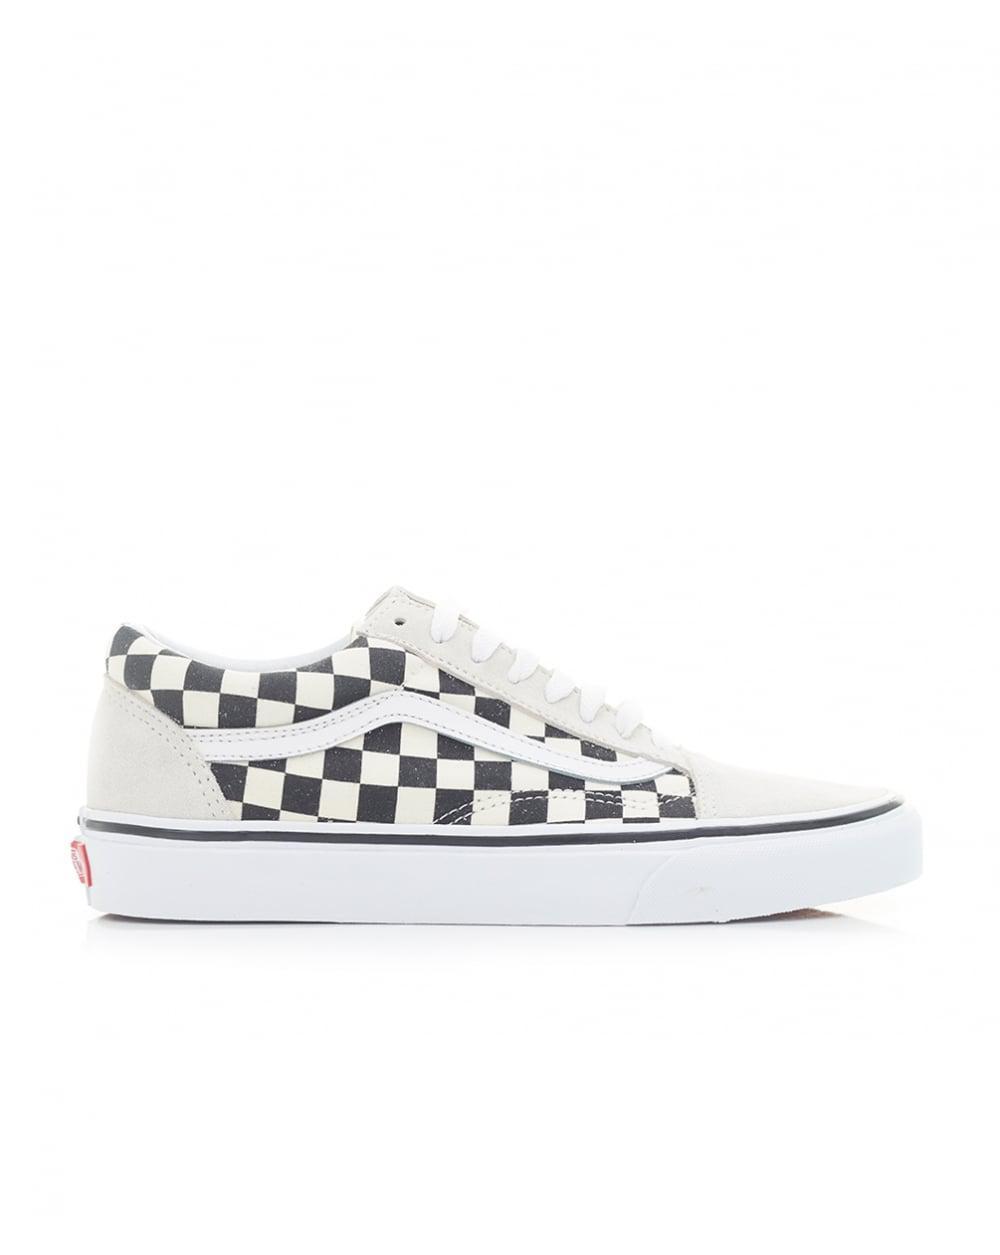 2729f0cc66 vans old skool trainers black white mix check